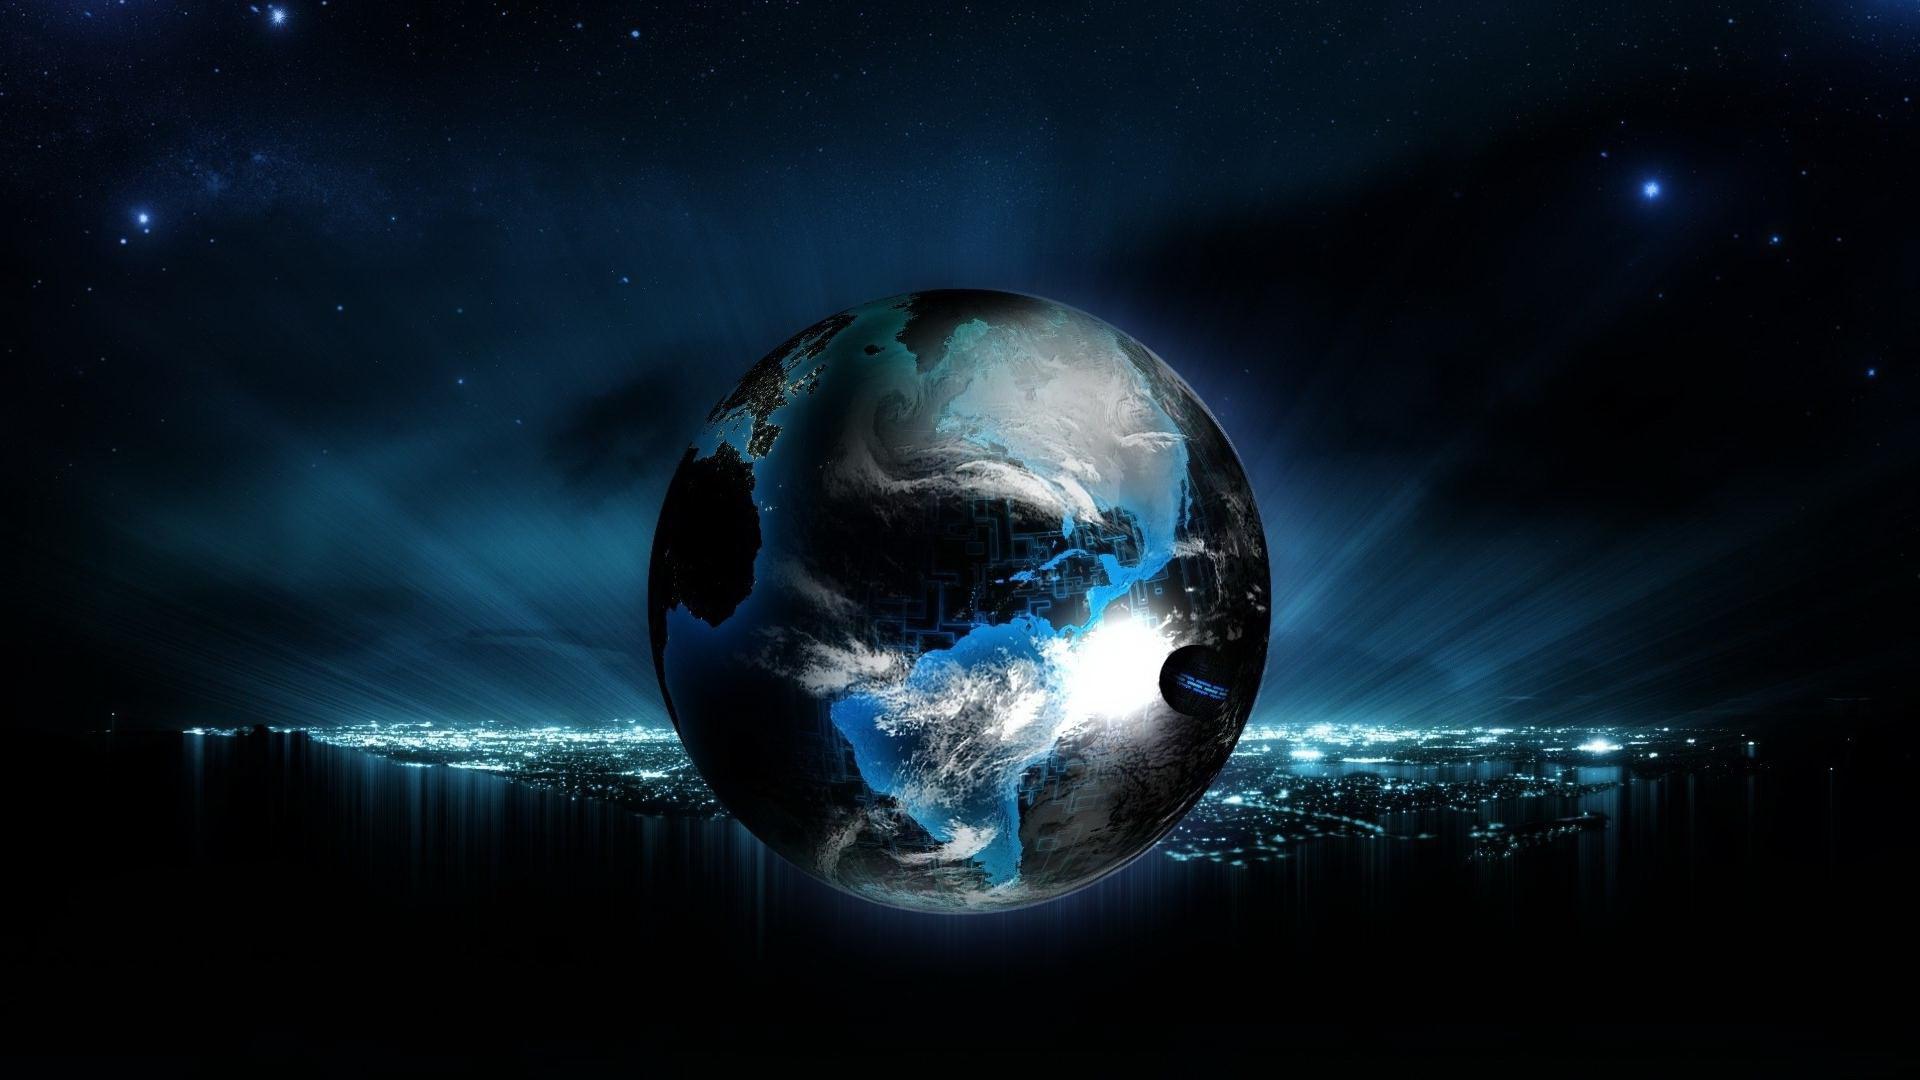 Space Live Wallpaper Free Download #18115 Wallpaper | Wallpaper hd